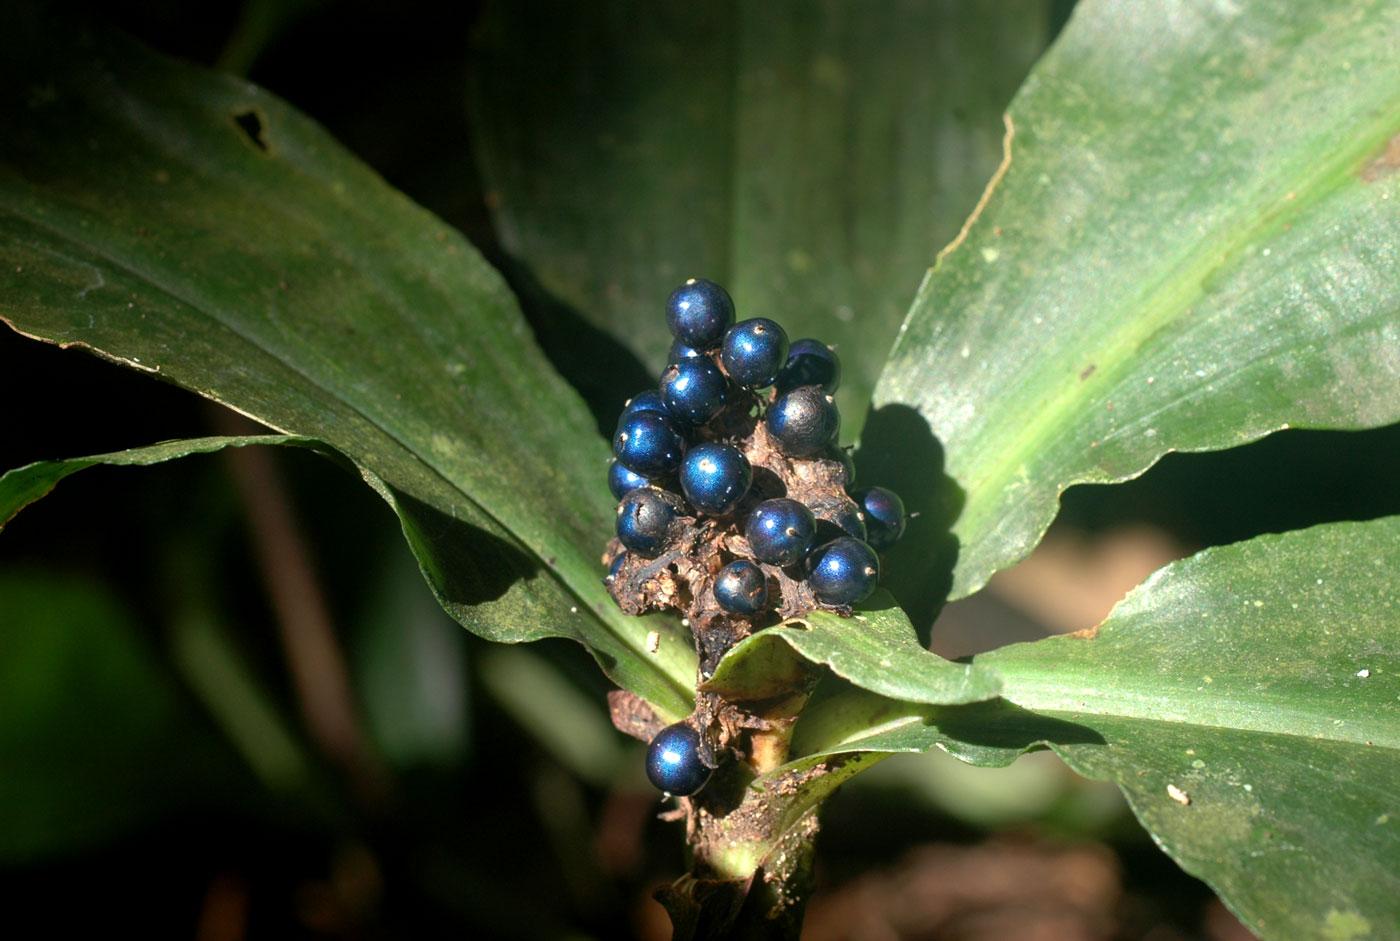 Pollia-condensata-marble-berries-berry-jessewaugh.com-3.jpg